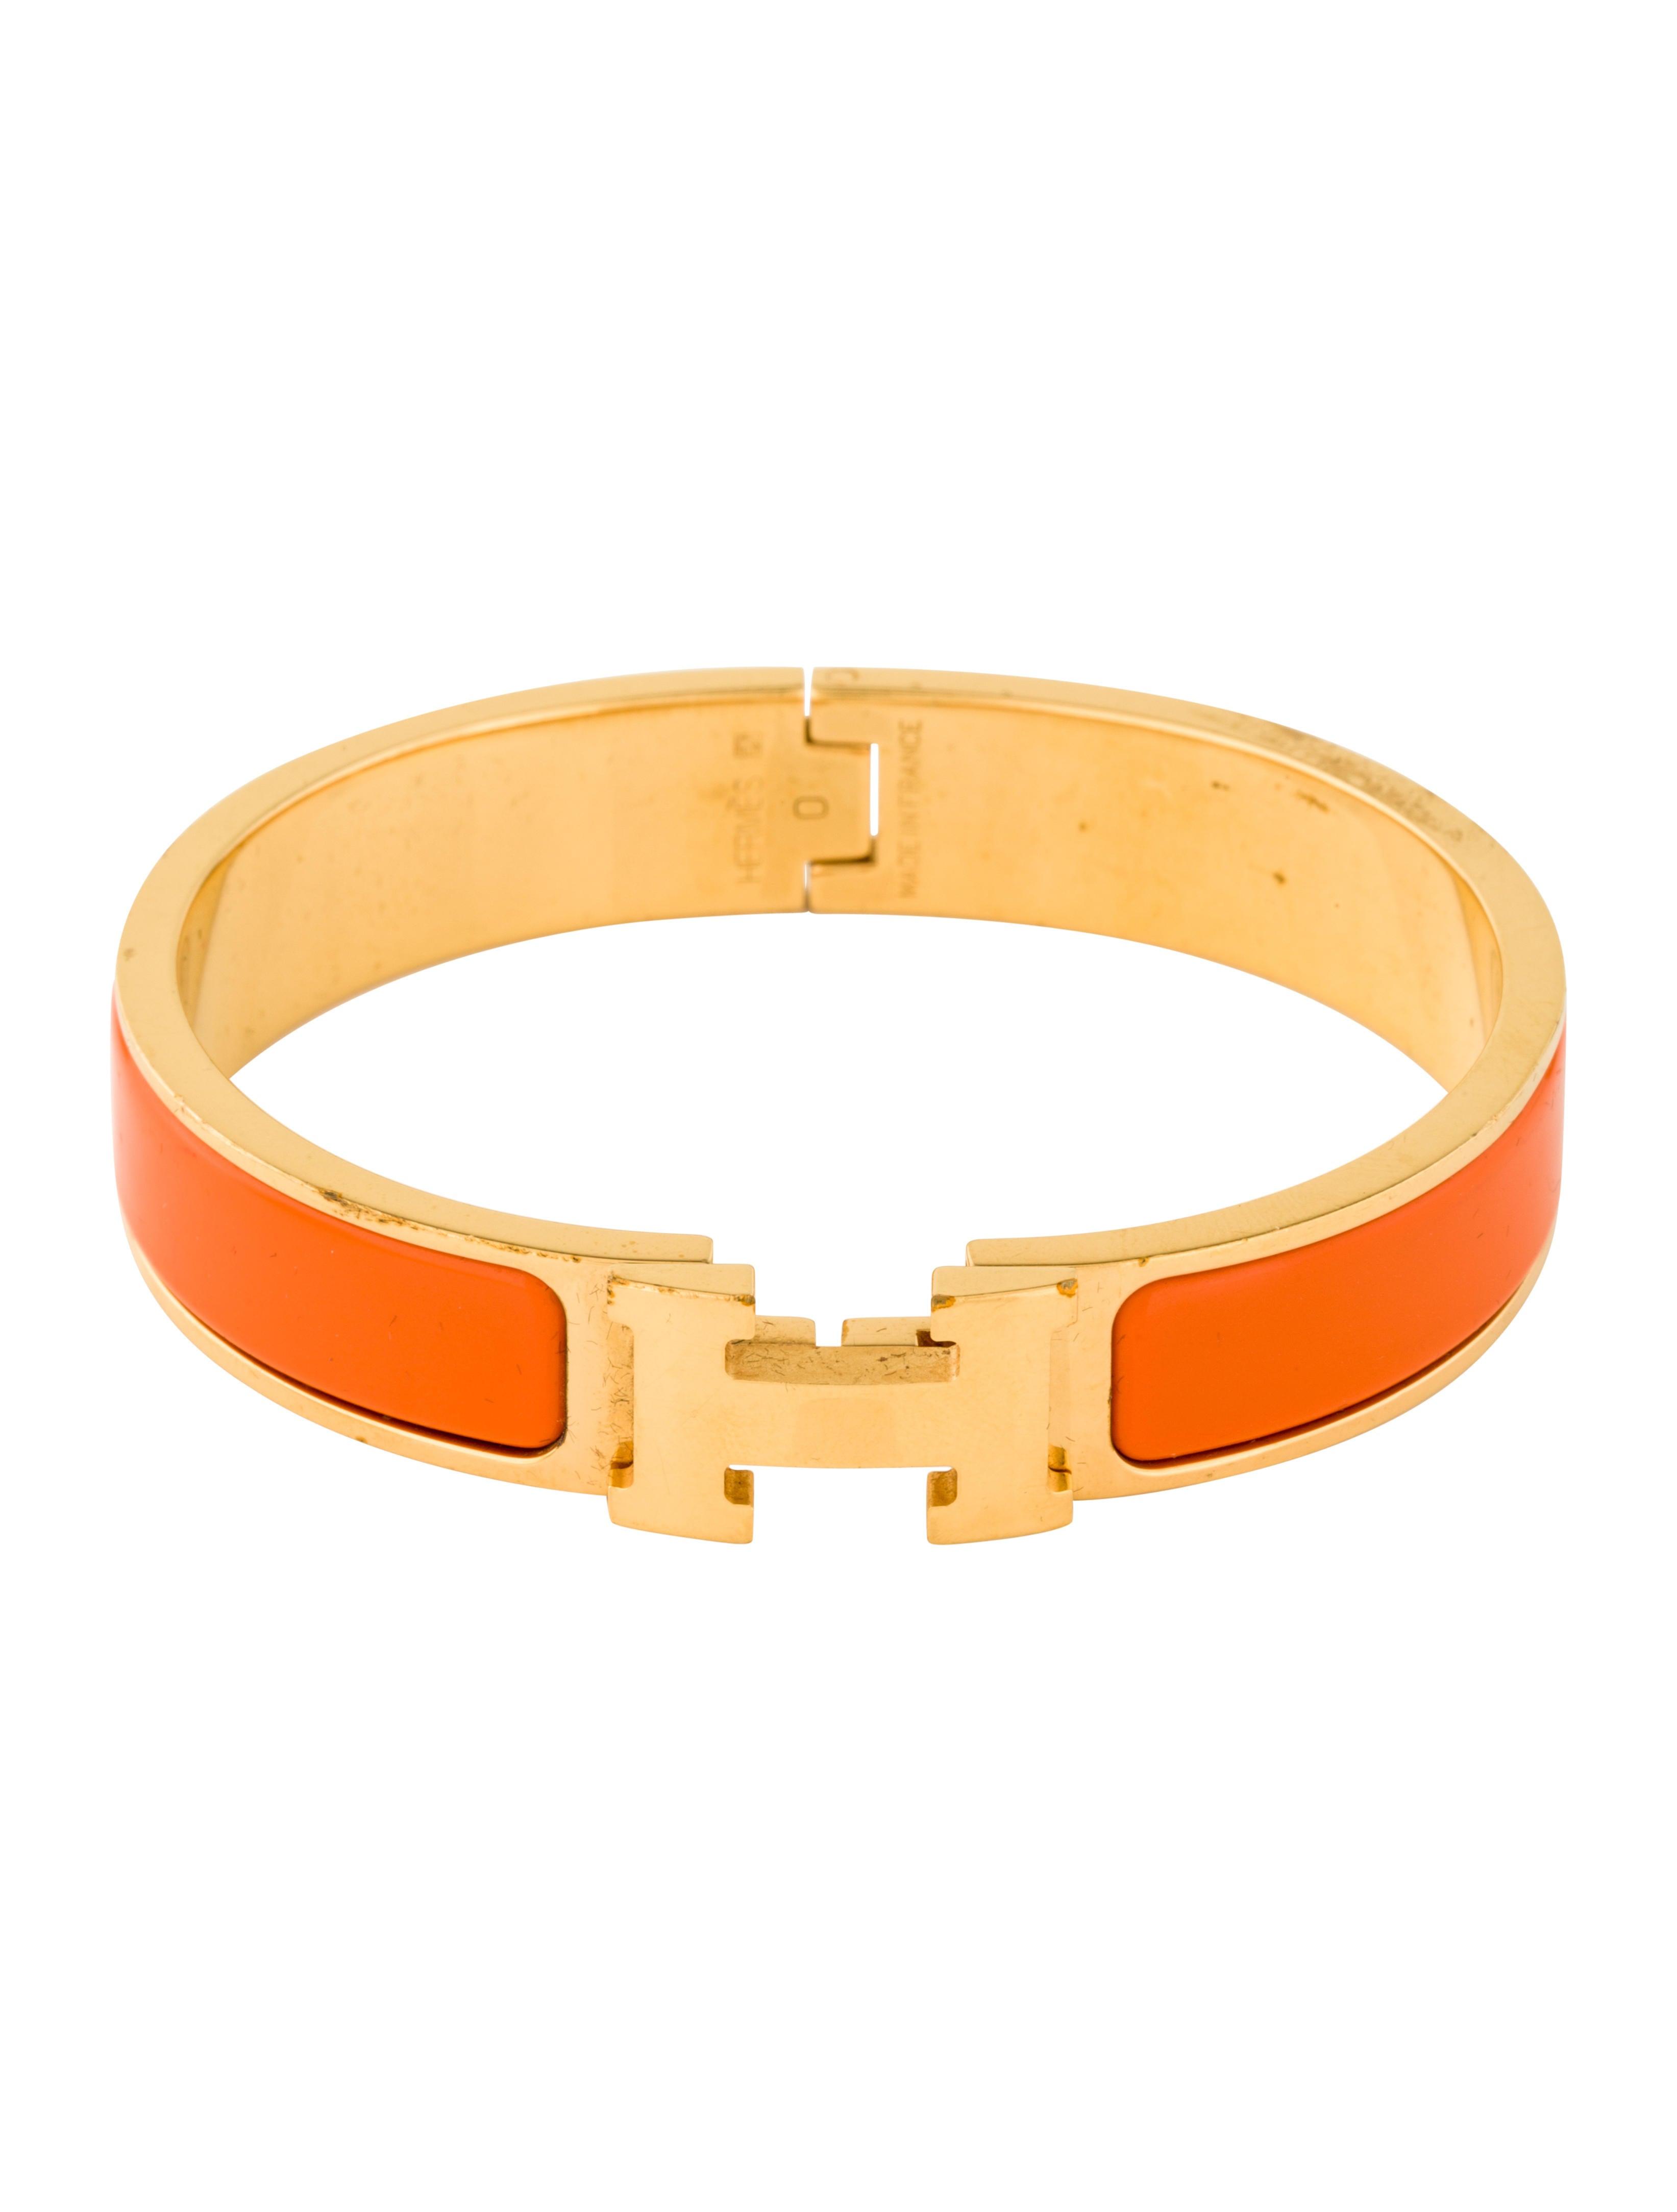 herm 232 s clic h bracelet bracelets her65454 the realreal